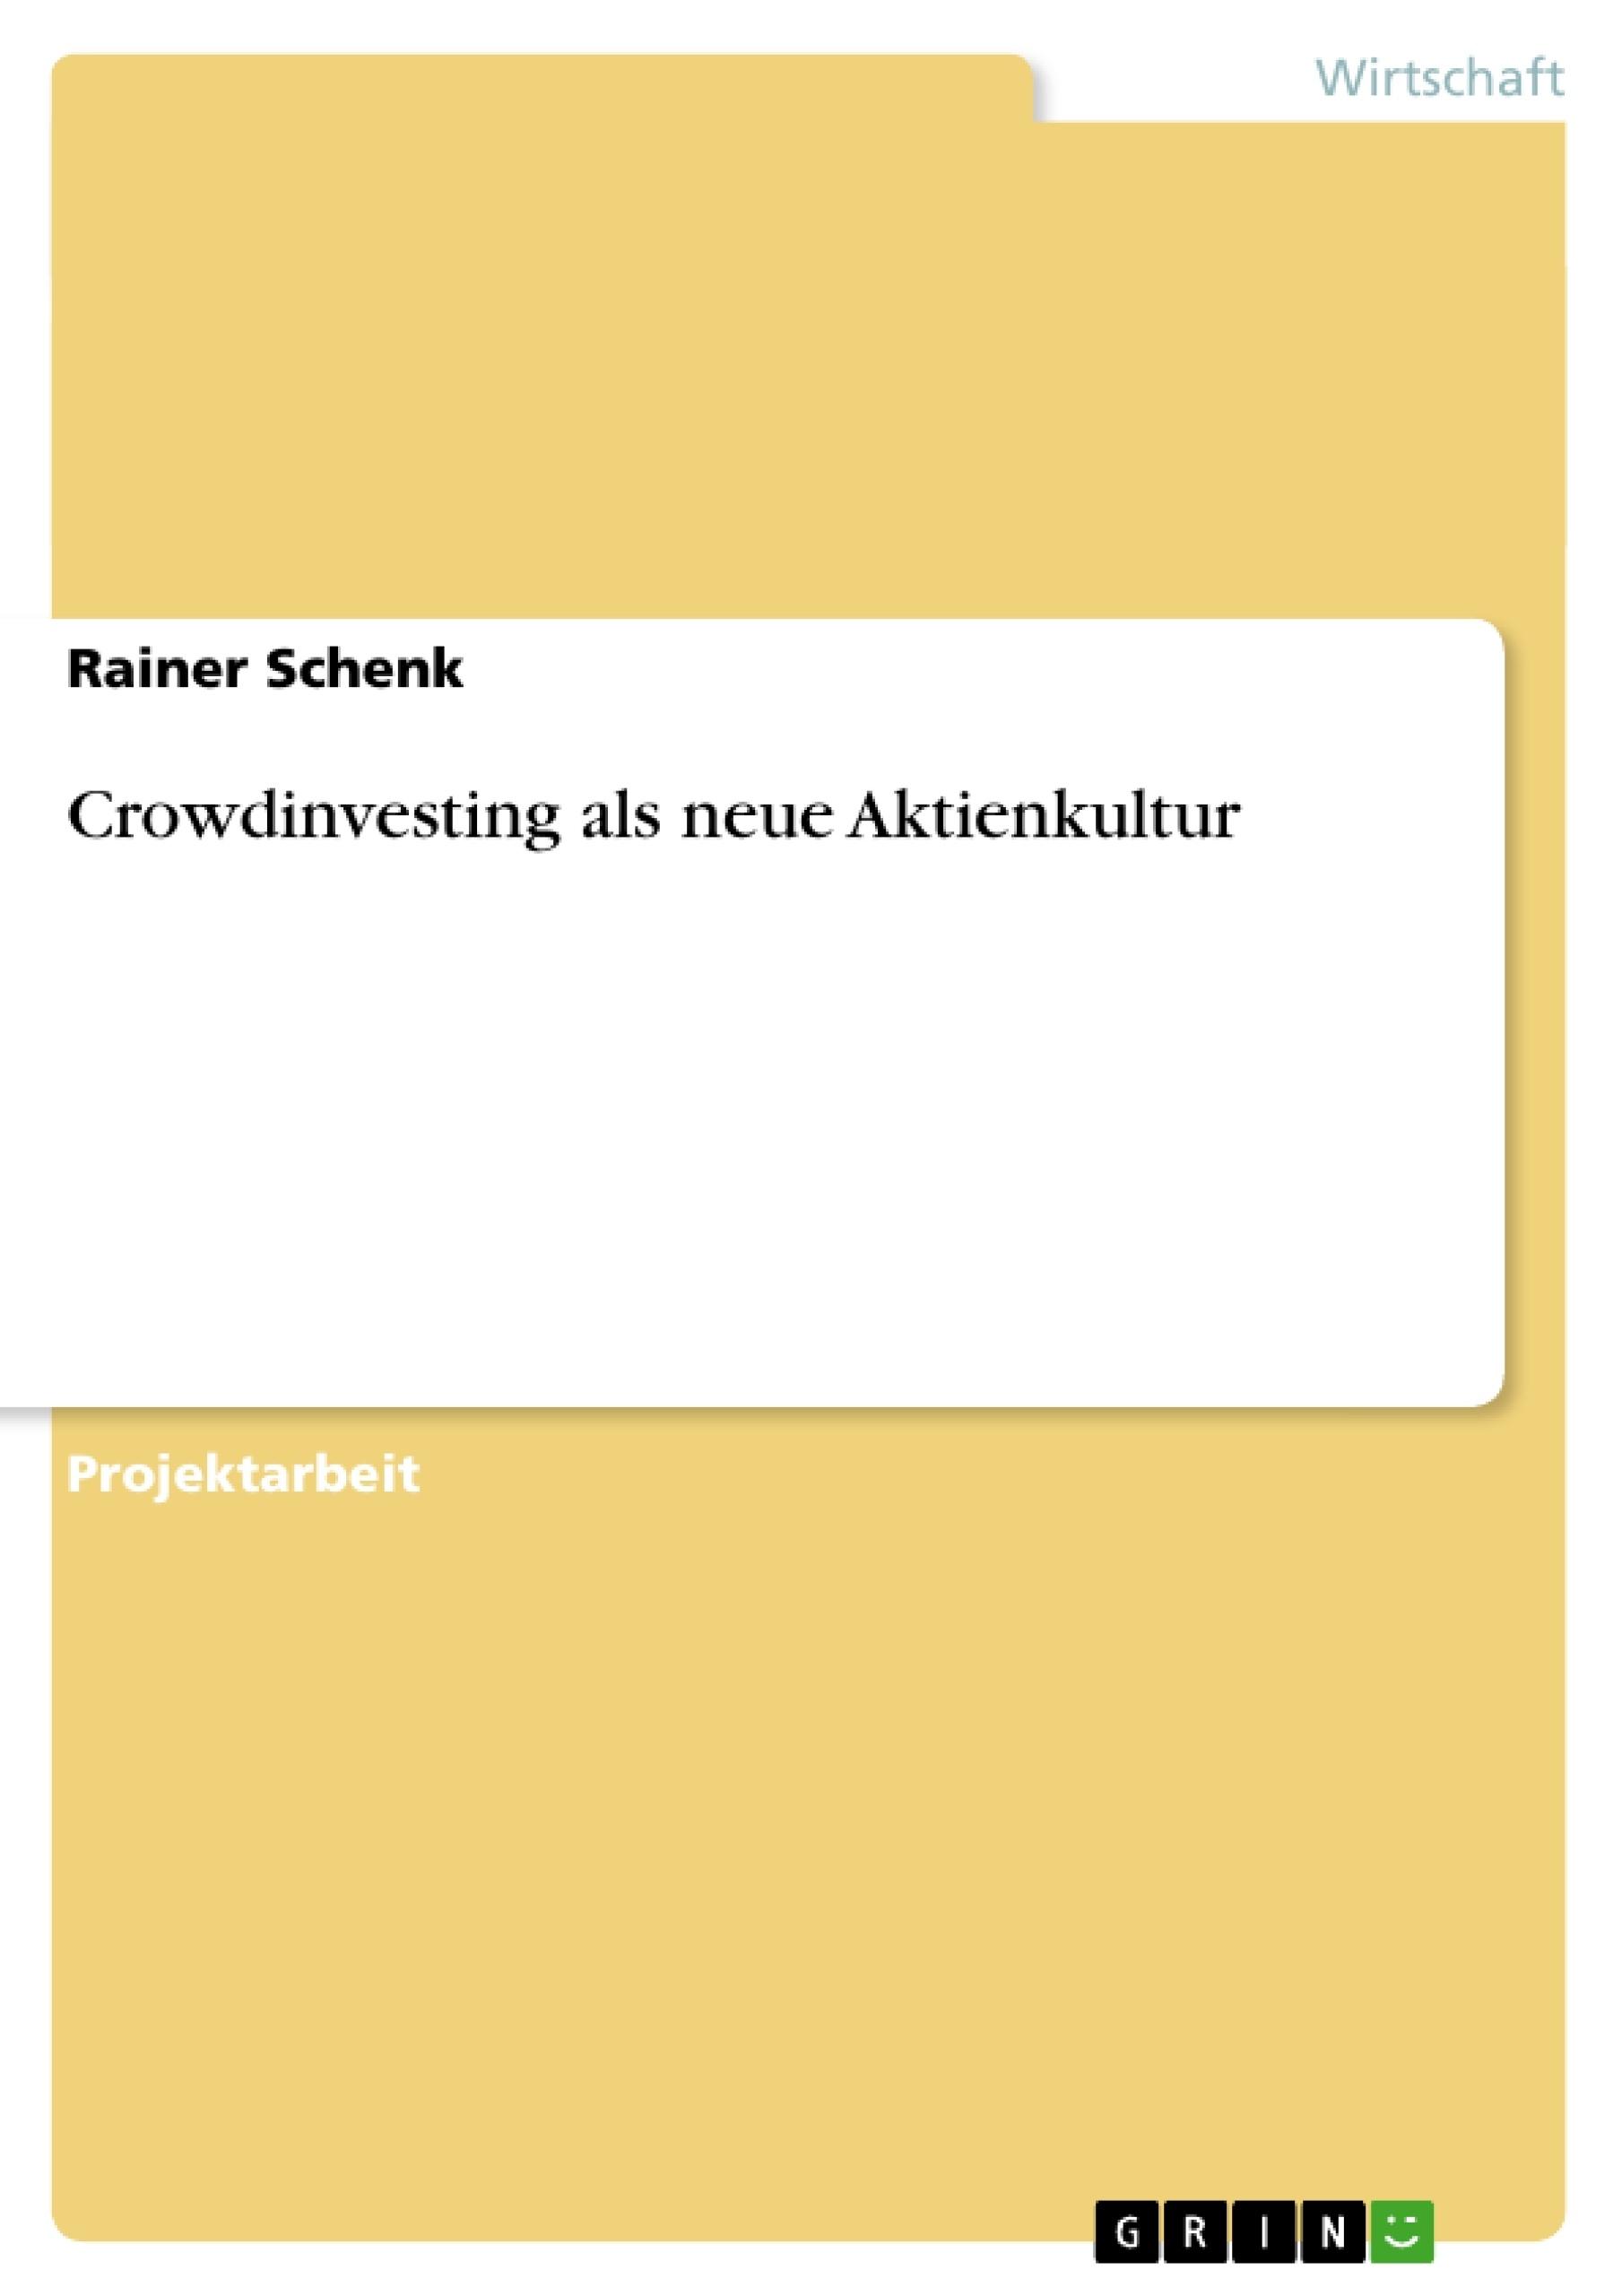 Titel: Crowdinvesting als neue Aktienkultur